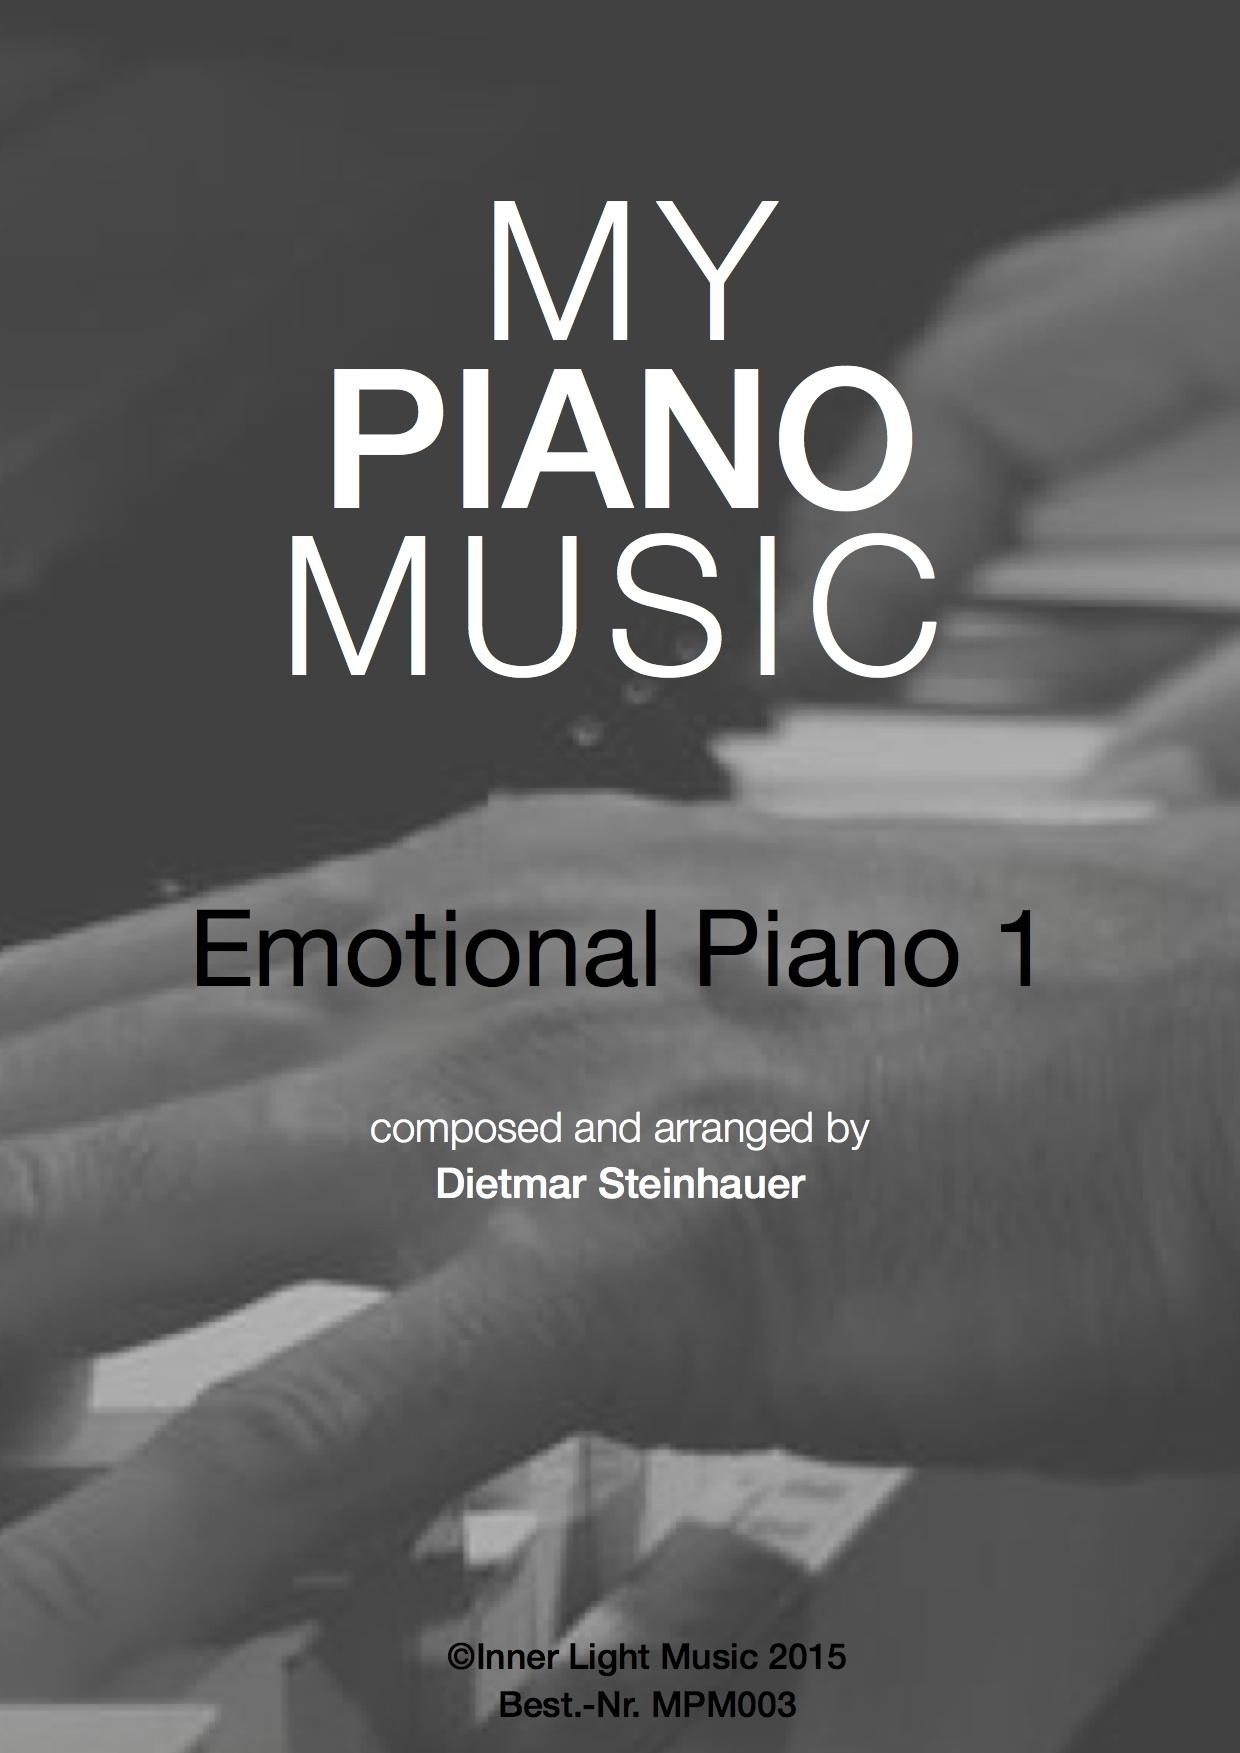 Emotional Piano 1 - My Piano Music Edition - tastenland